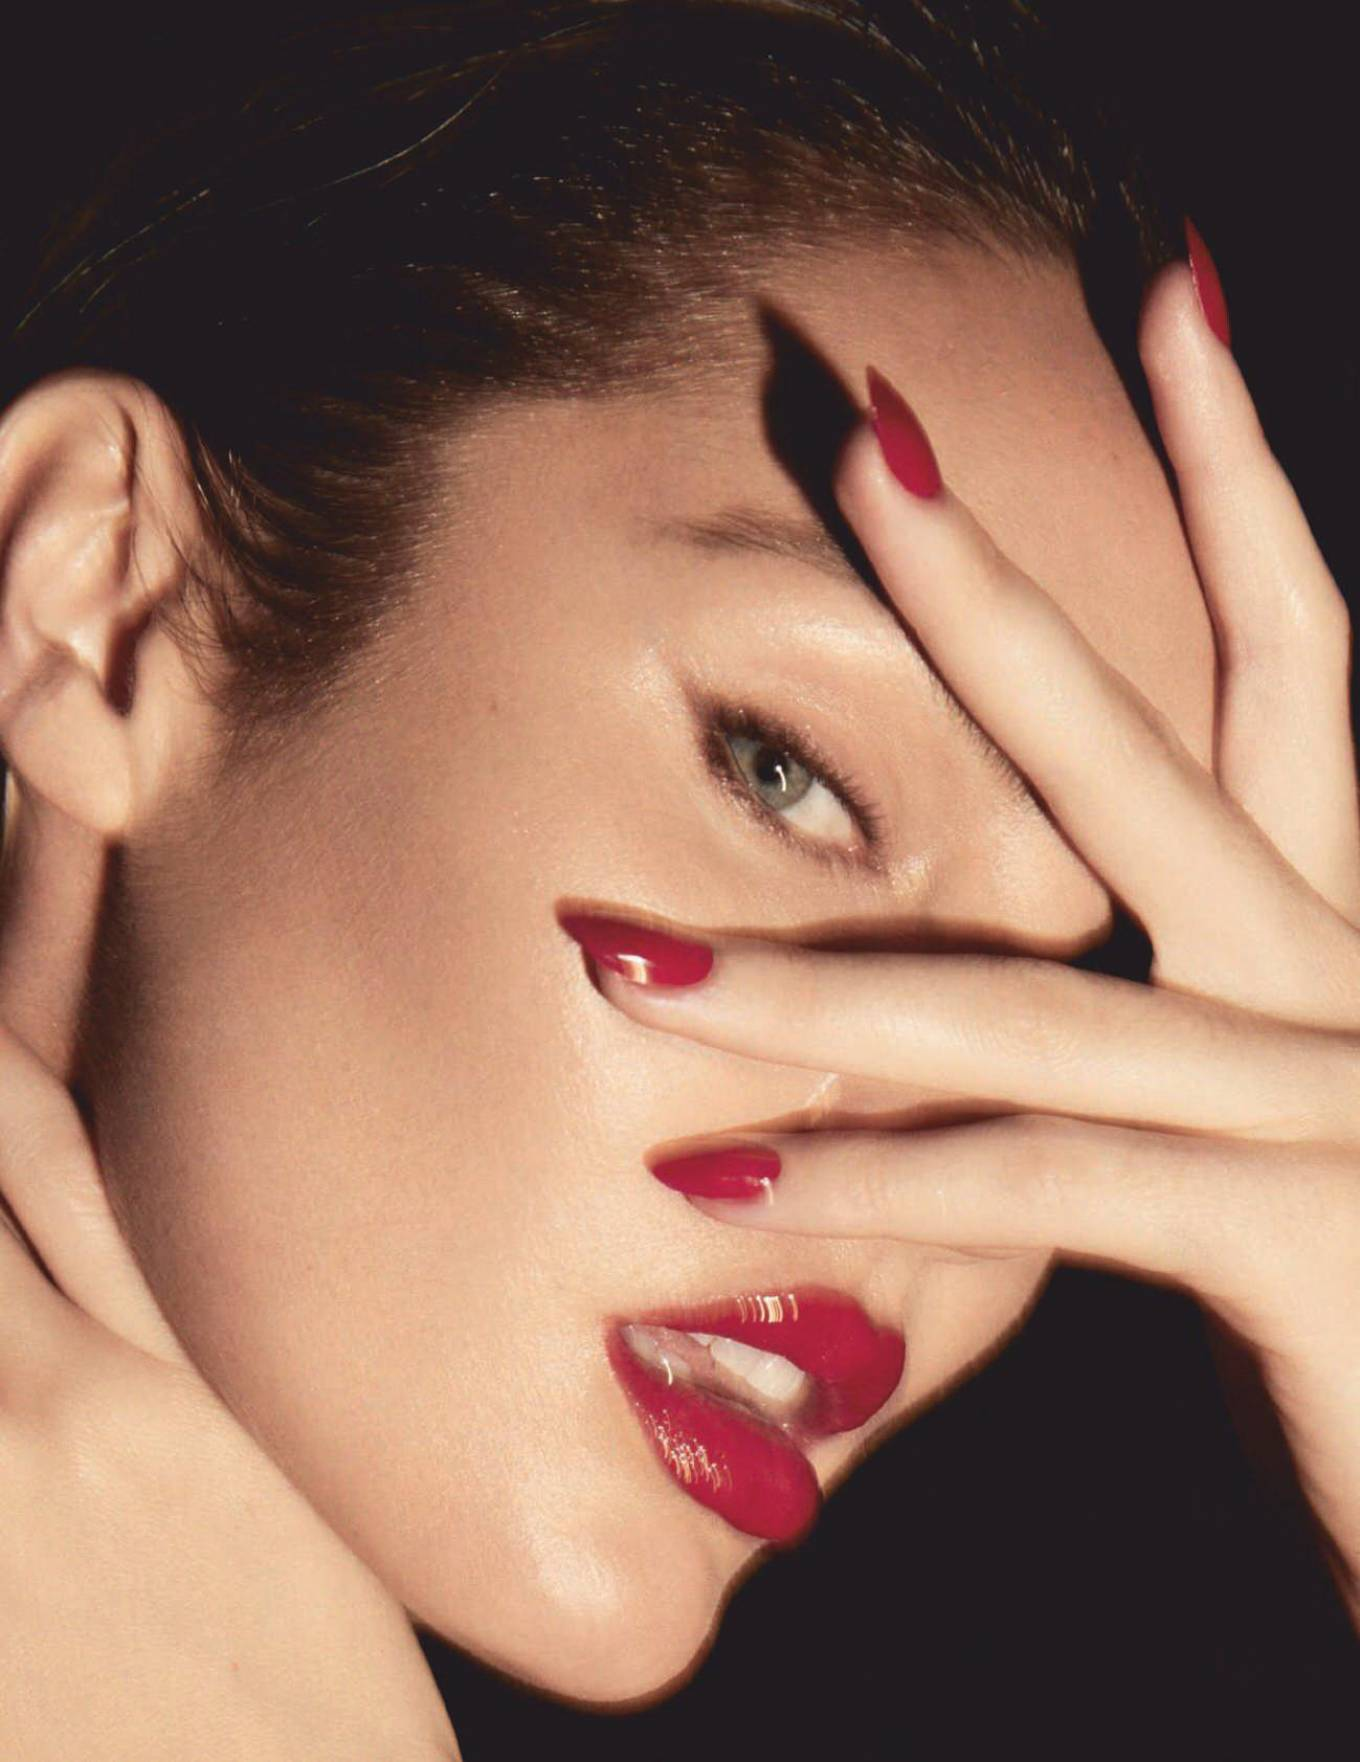 Candice Swanepoel 2020 : Candice Swanepoel – For Harpers Bazaar Magazine (Spain – October 2020 issue)-05